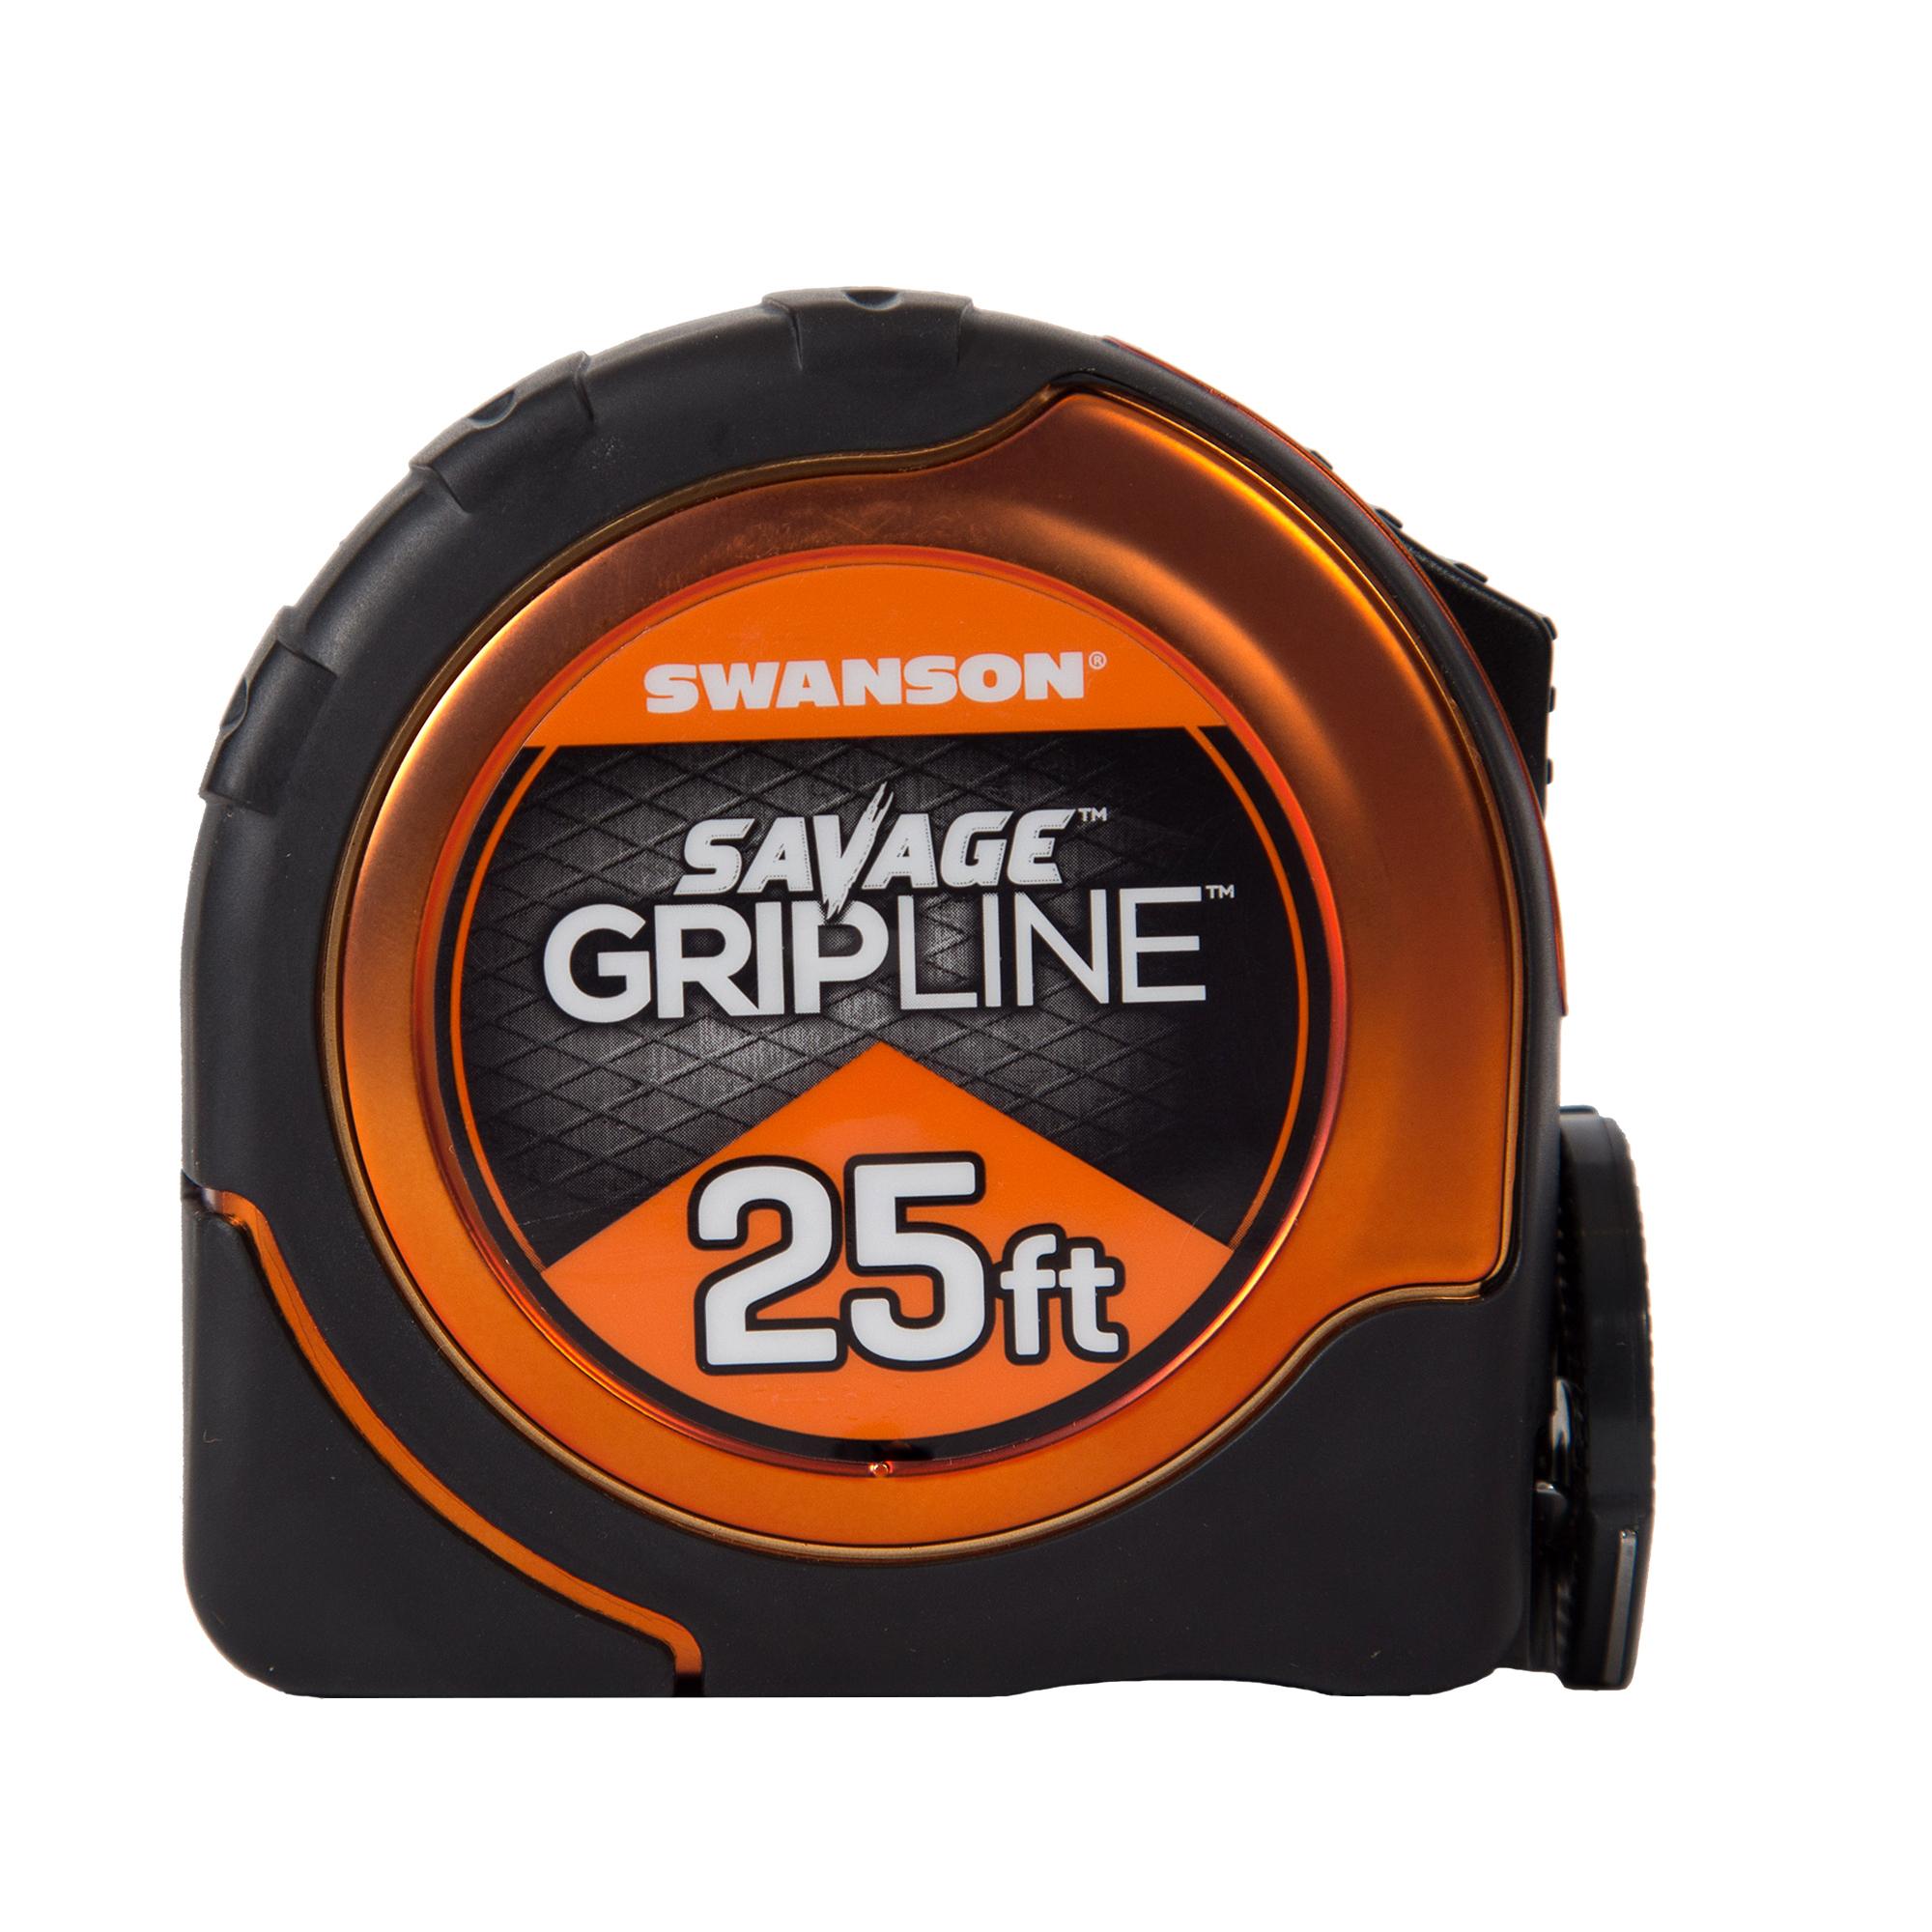 Swanson SAVAGE SVGL25M1 25-Foot GripLine Magnetic Measuring Tape